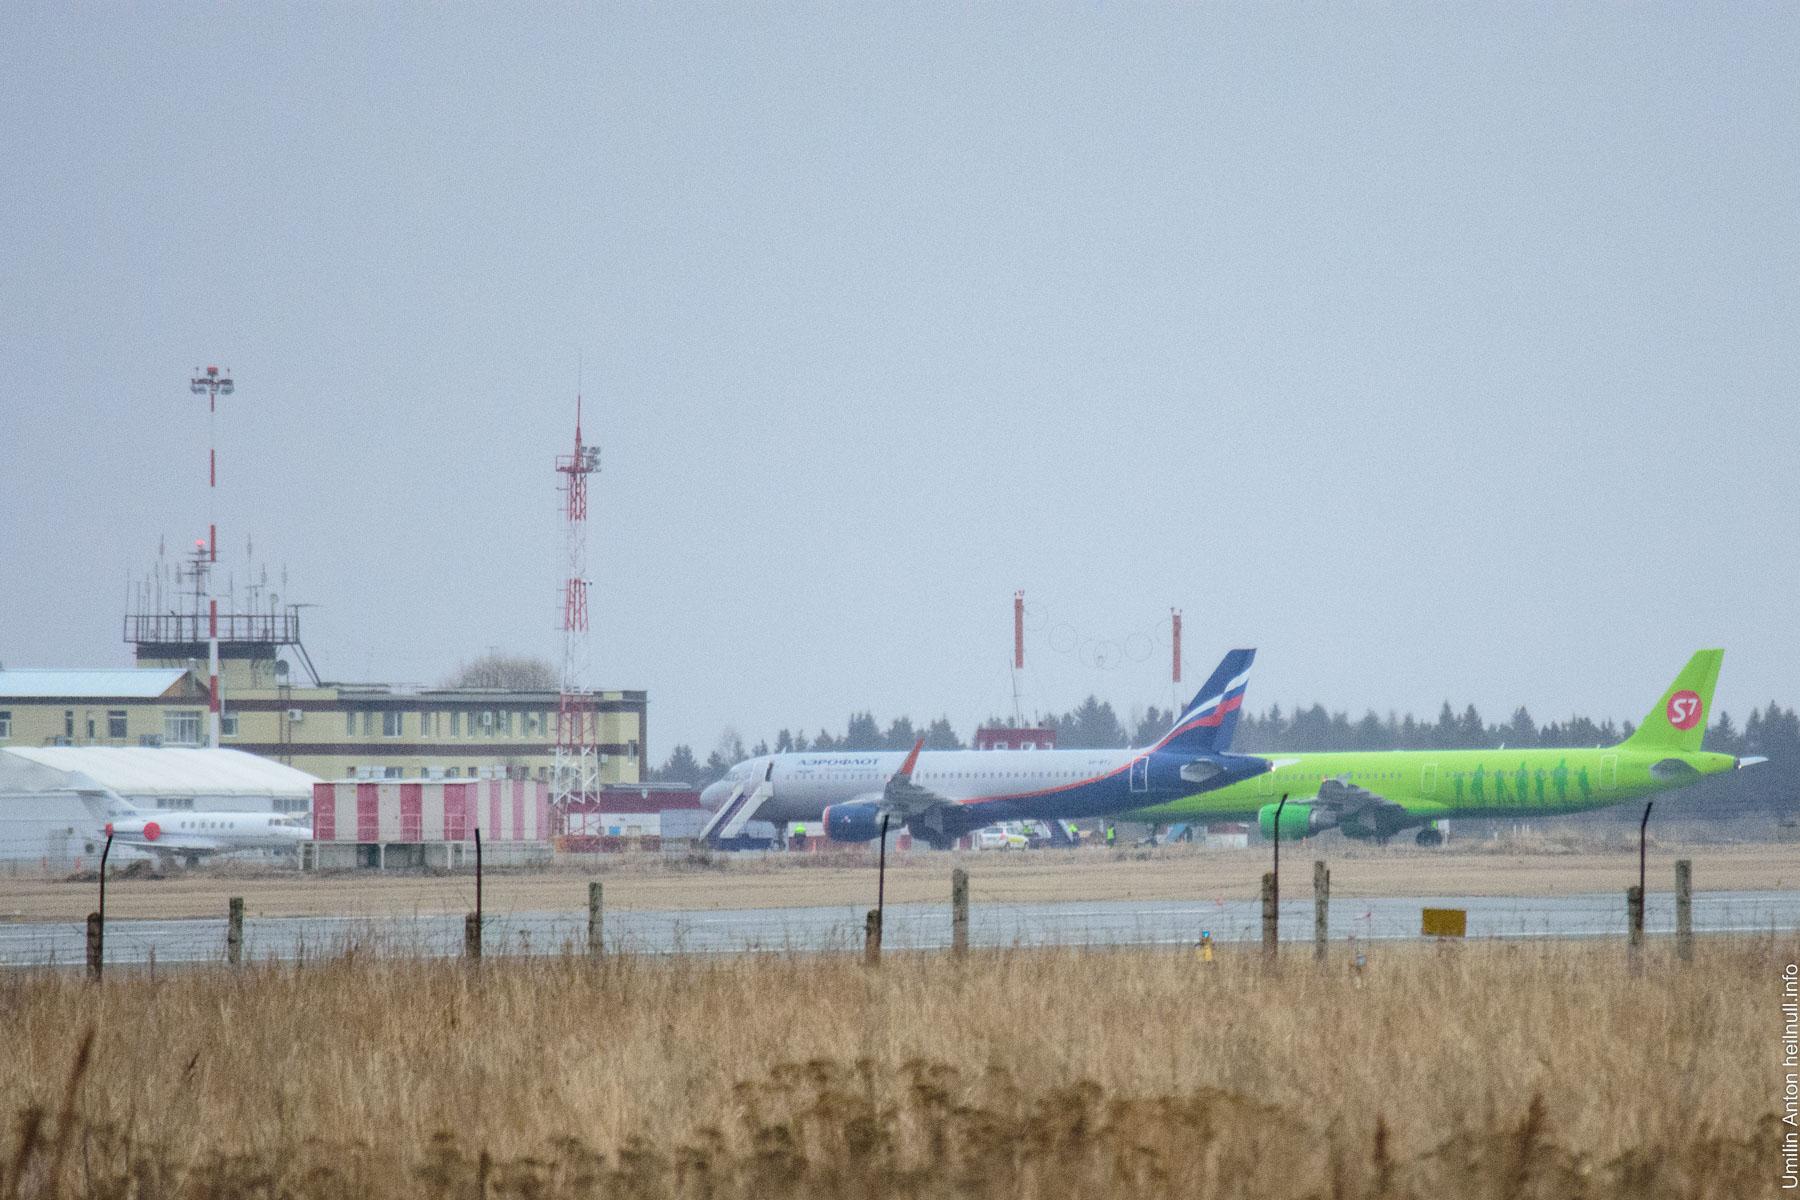 UAY_4582-8